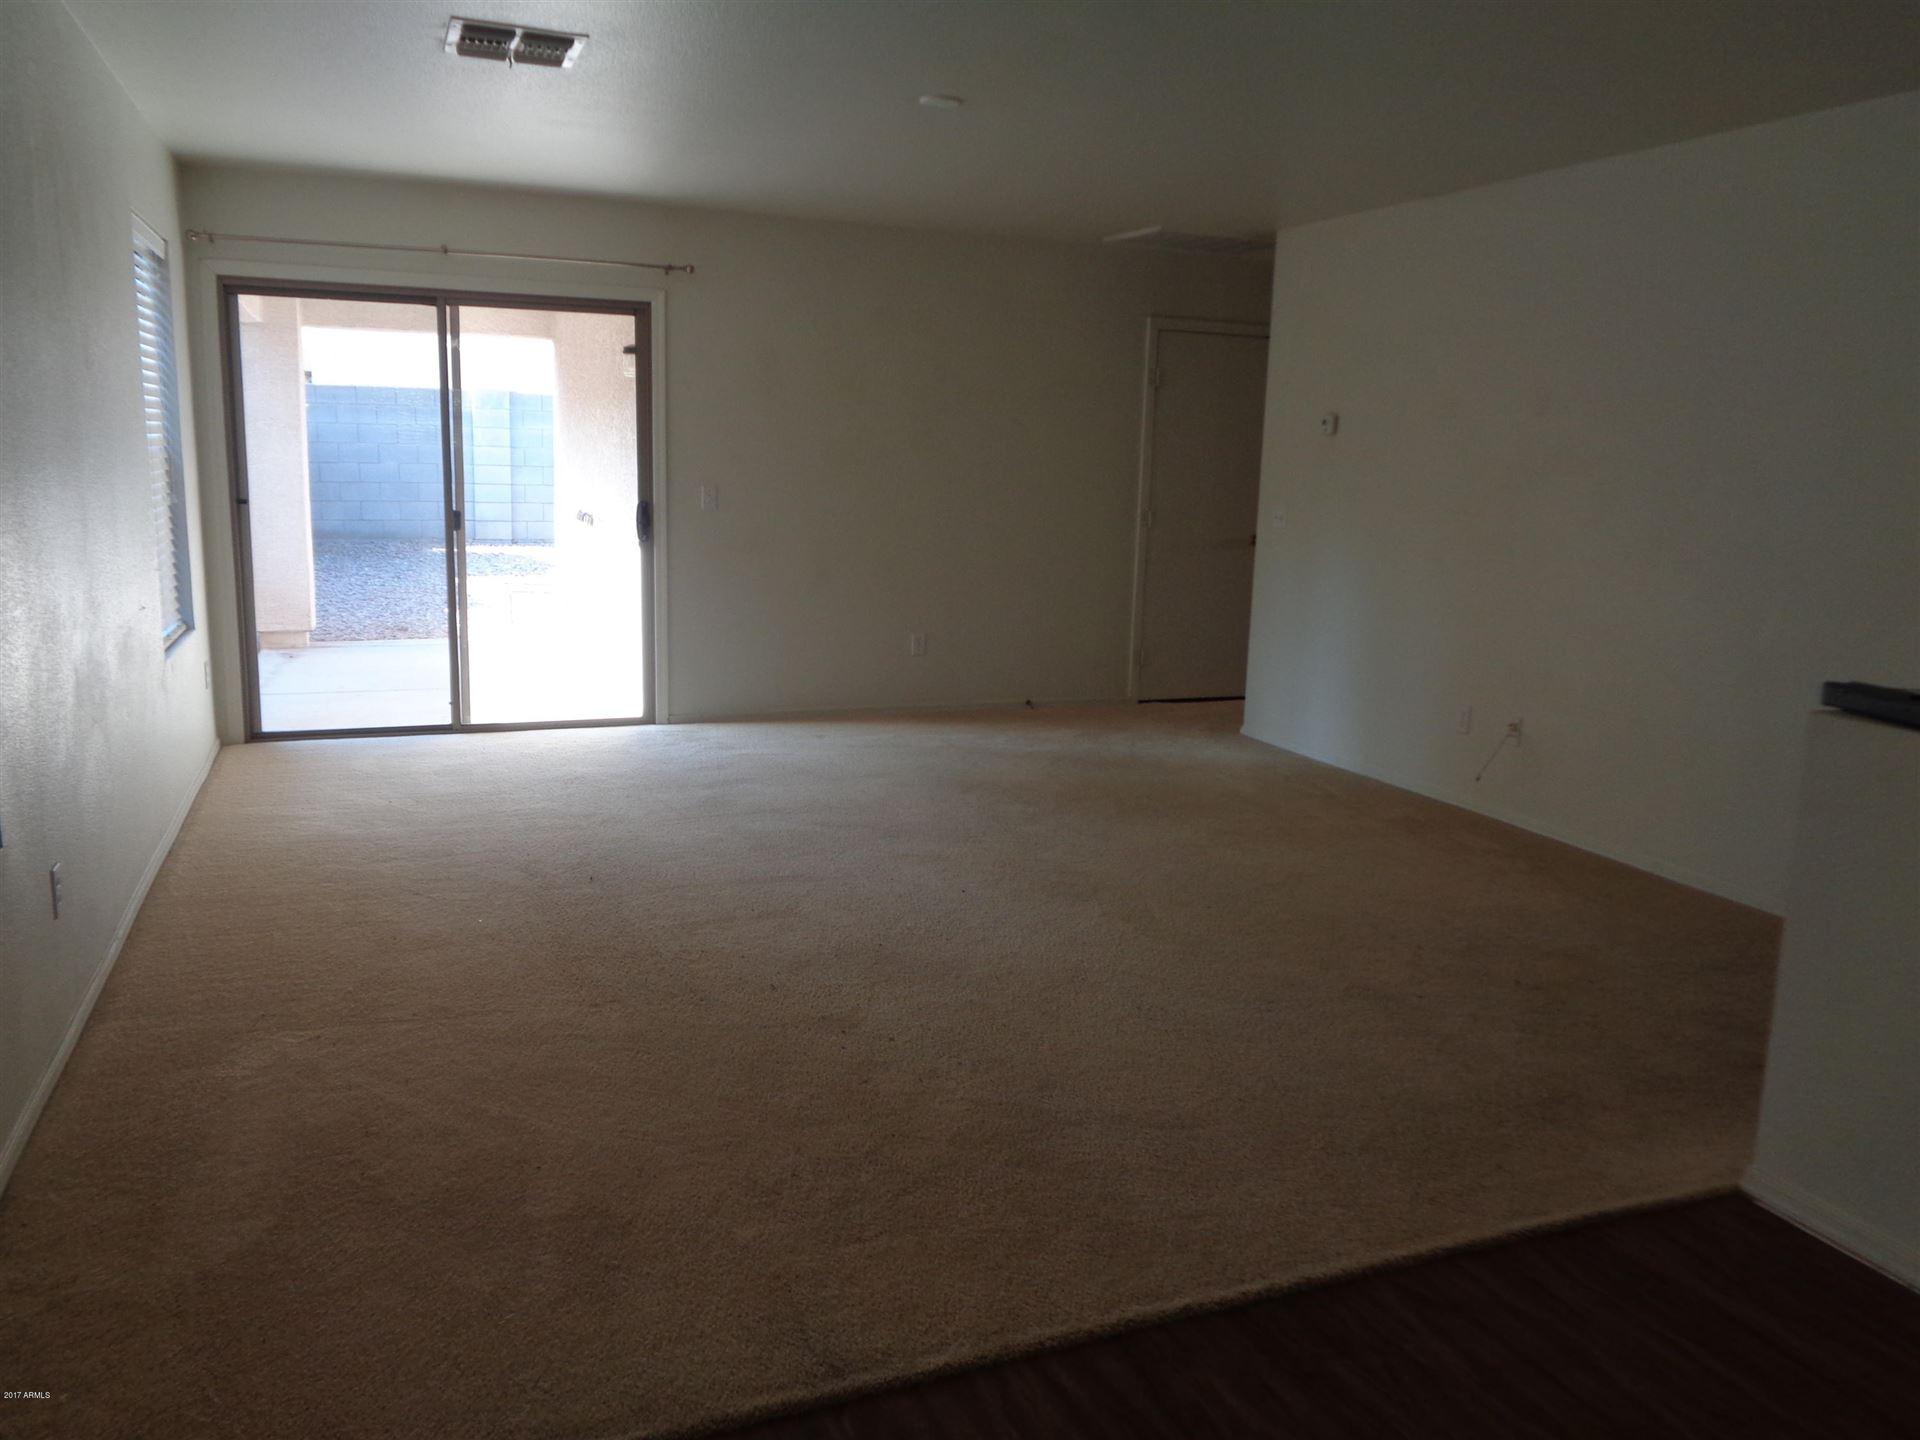 Photo of 1095 E PARKVIEW Court, Gilbert, AZ 85295 (MLS # 6249460)